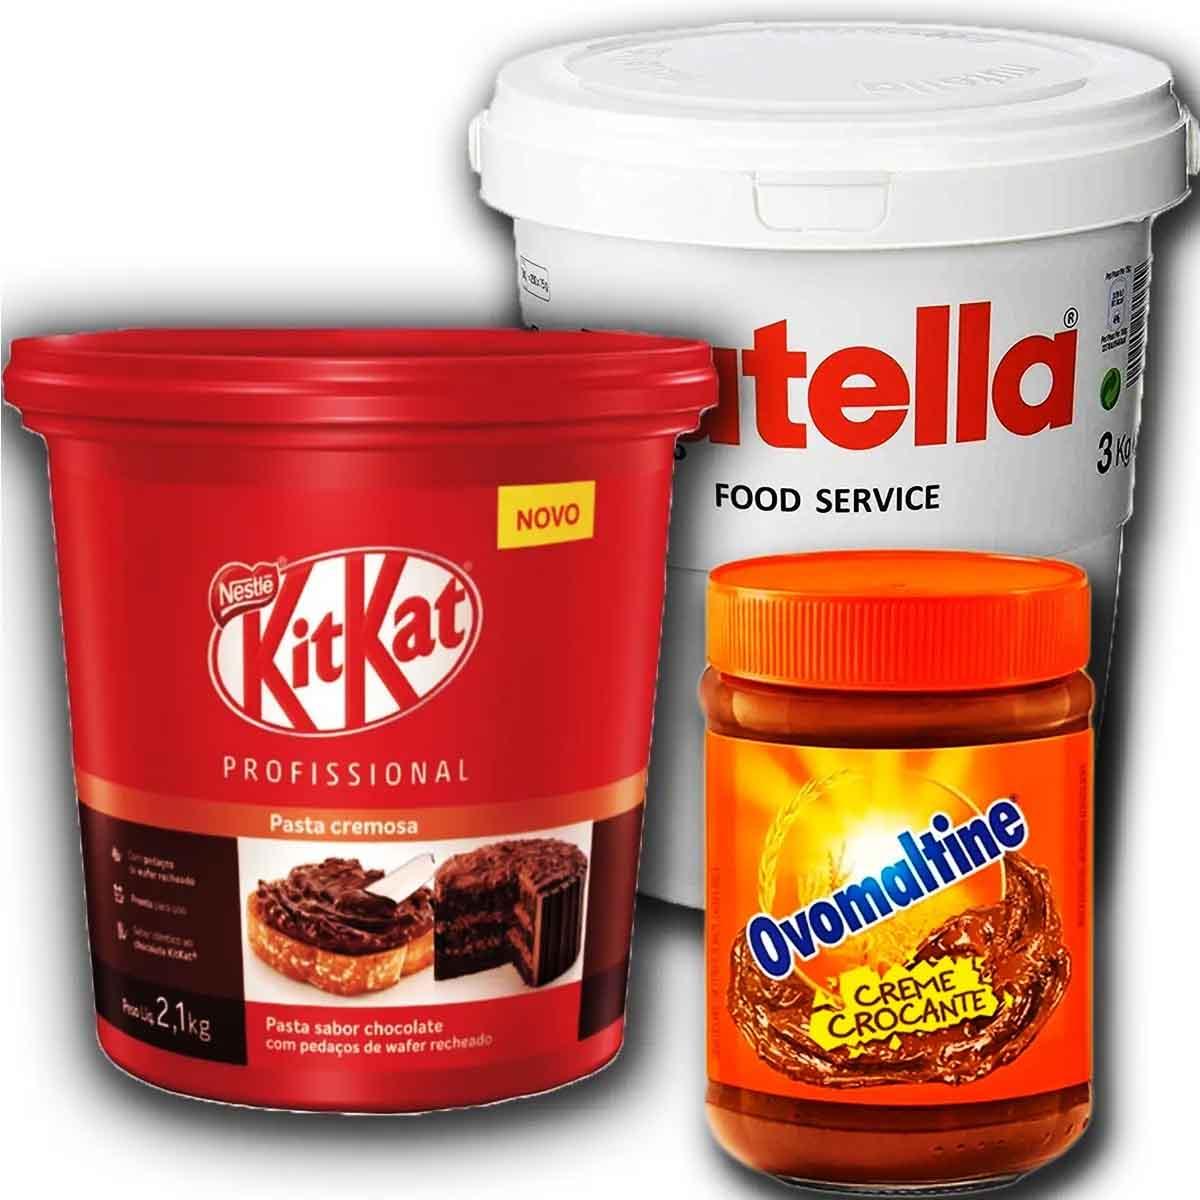 Creme Crocante Ovomaltine+ Pasta Kitkat 2,1kg + Nutella 3kg